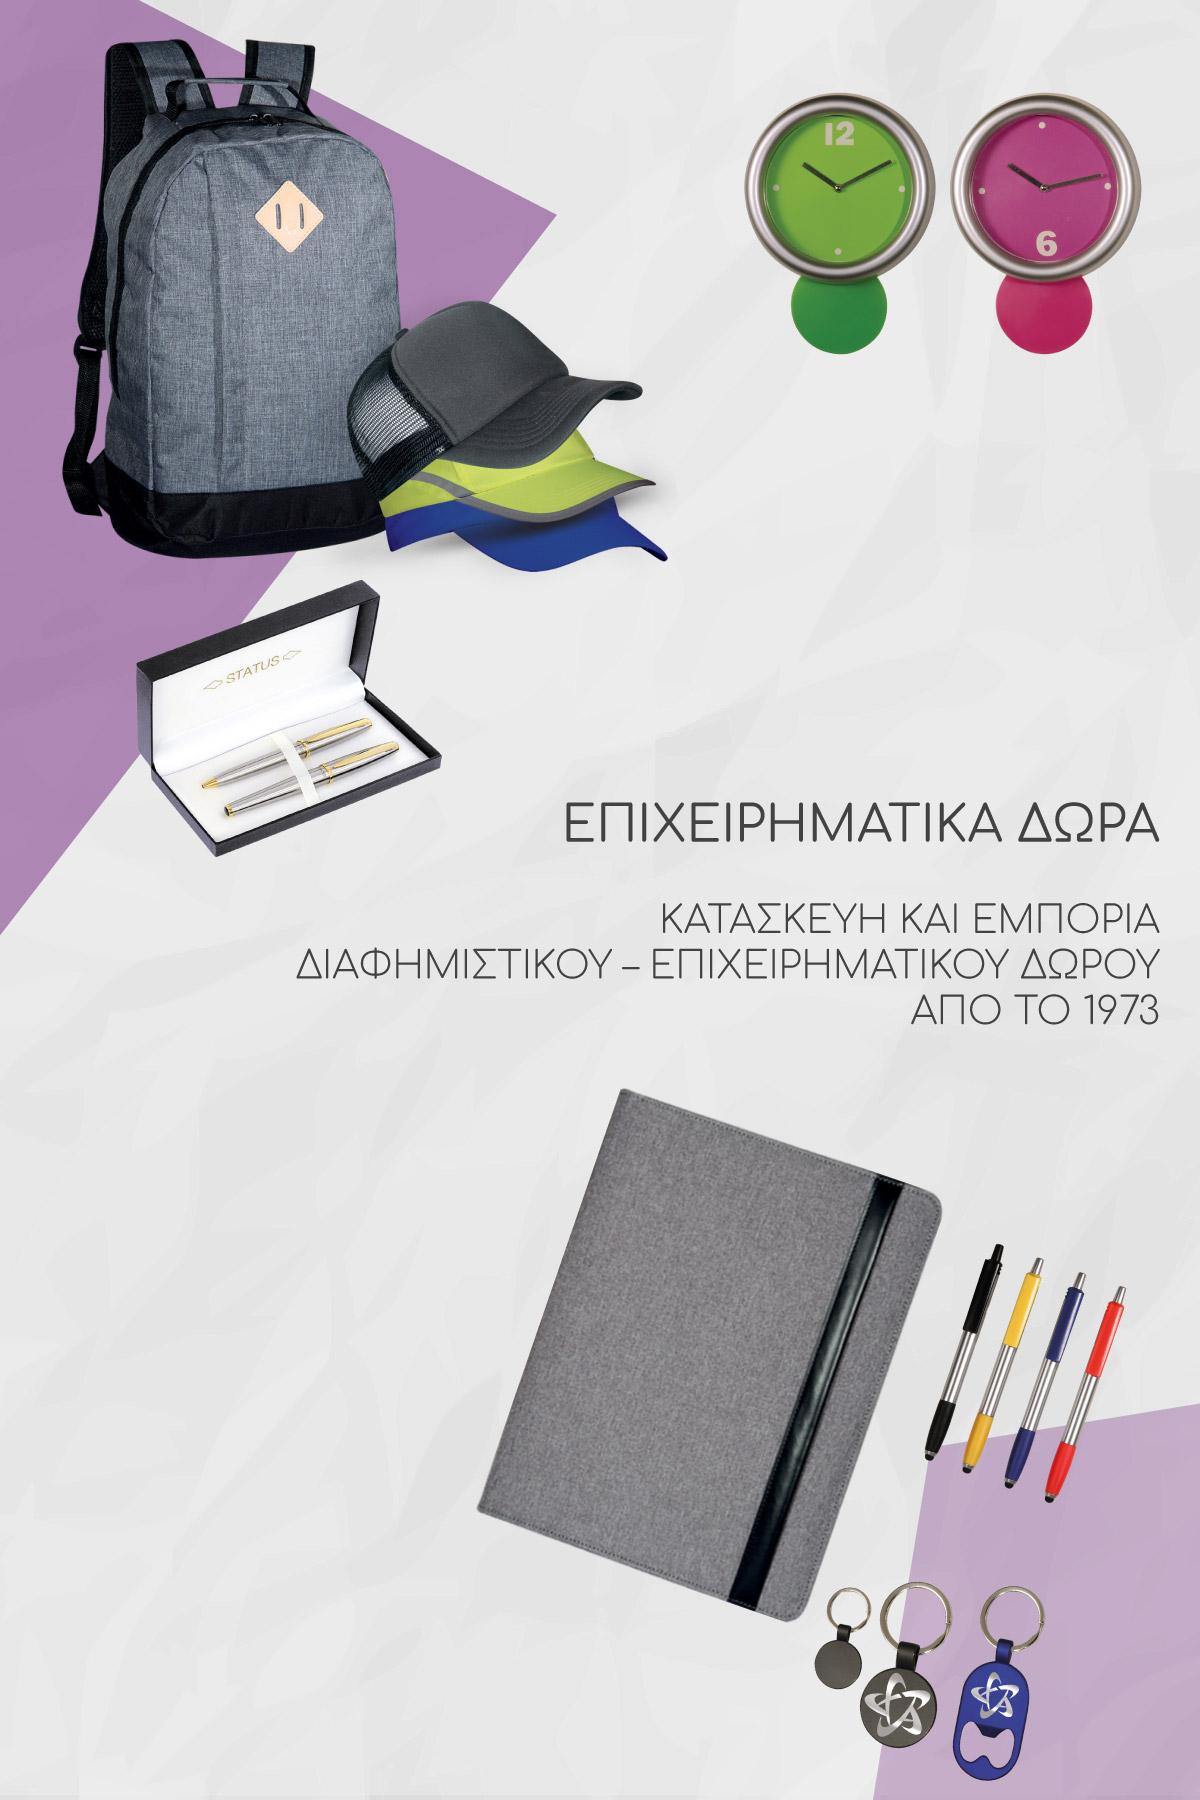 3e1c76471990 Διαφημιστικά και επιχειρηματικά δώρα